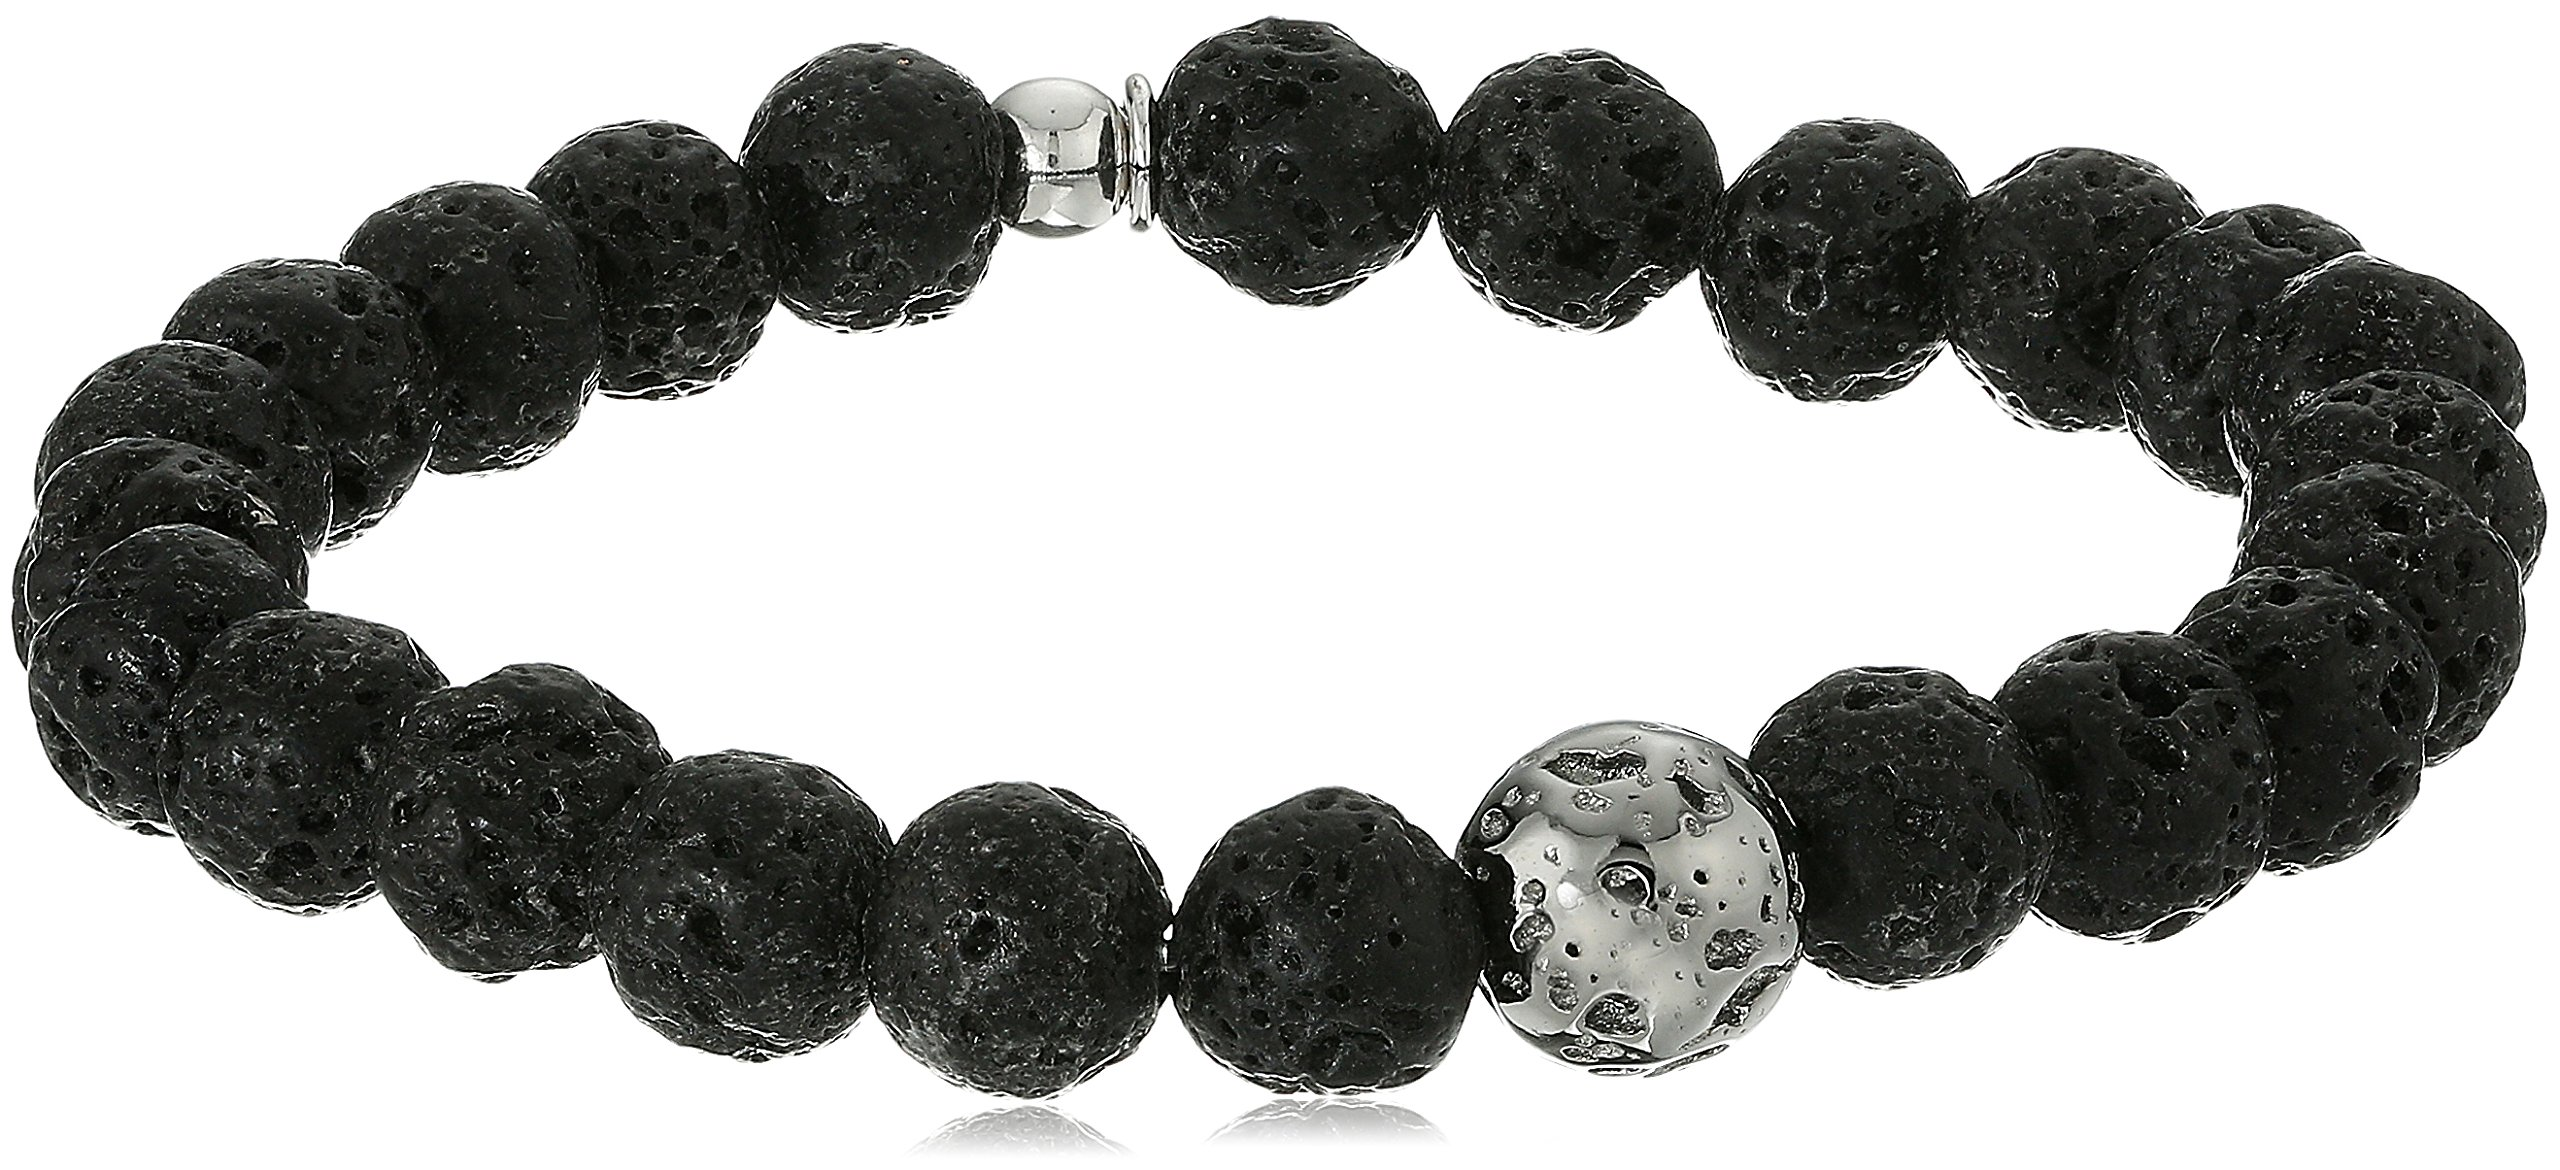 Tateossian Asteroid Ruthenium Silver Lava Beads Black Bracelet, Large